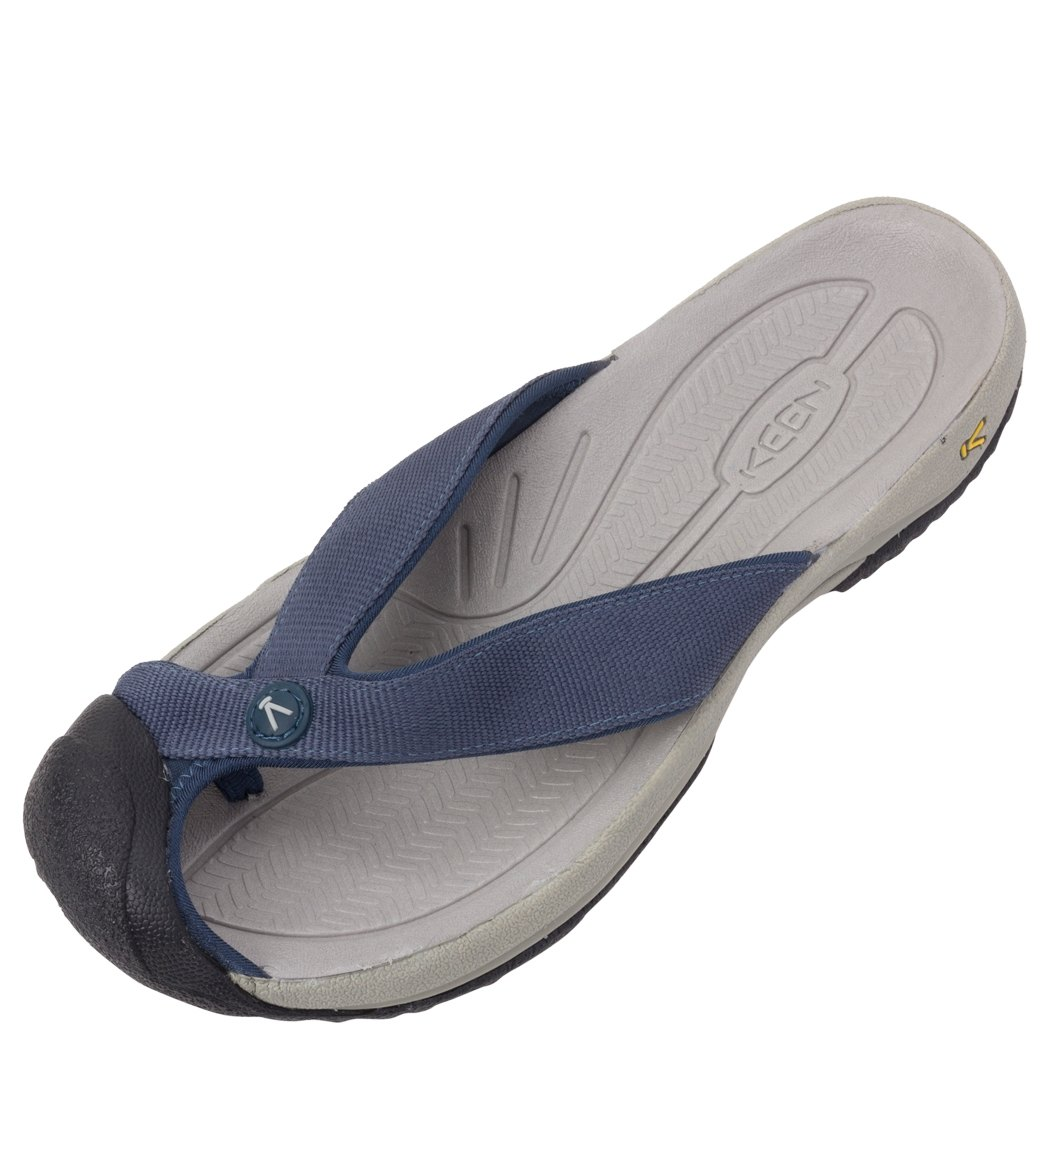 96d6957c91b Keen Men s Waimea H2 Sandal at SwimOutlet.com - Free Shipping